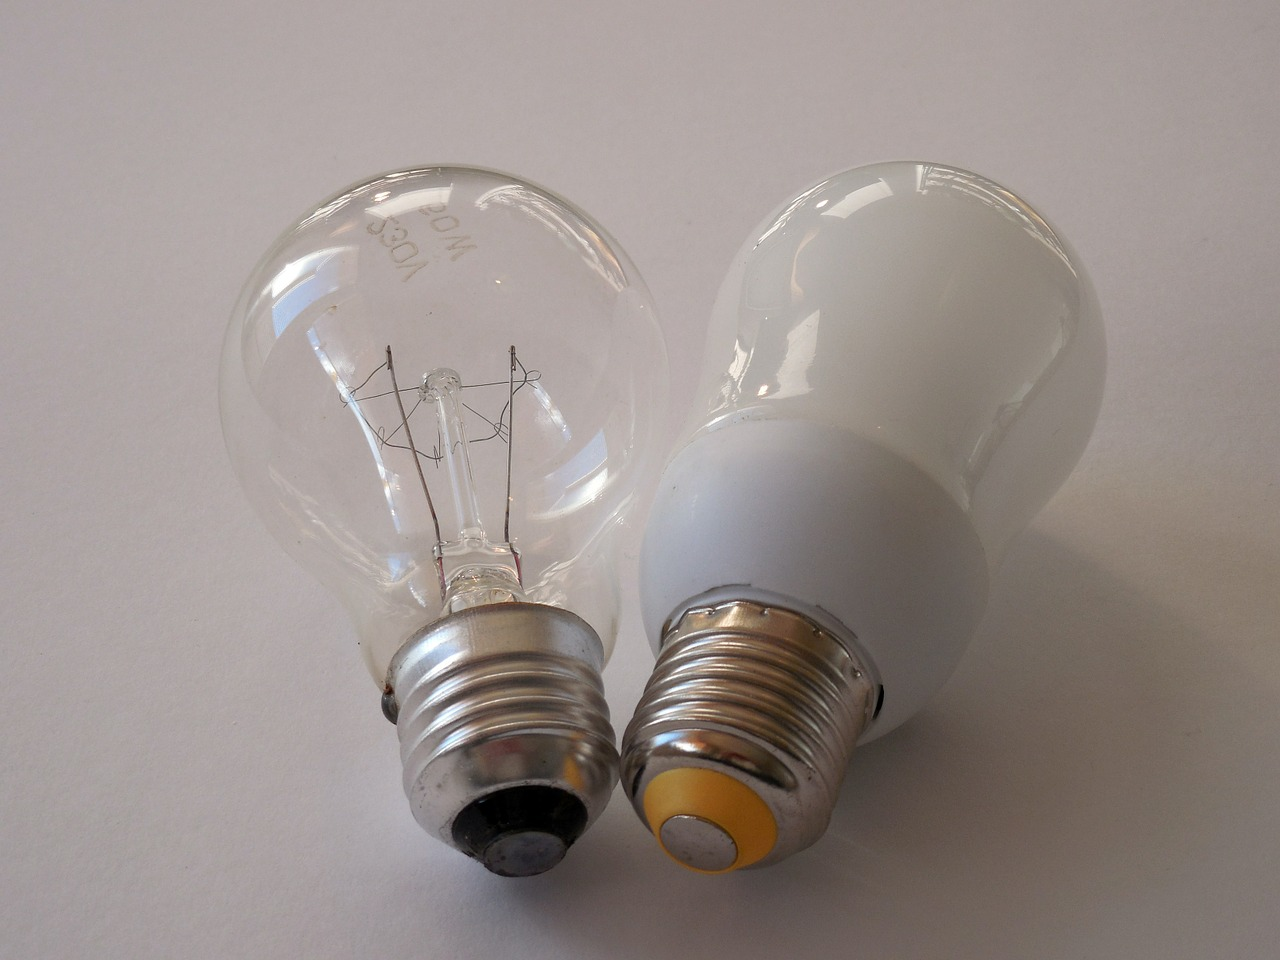 Glühlampe vs. Halogenlampe vs Energiesparlampe